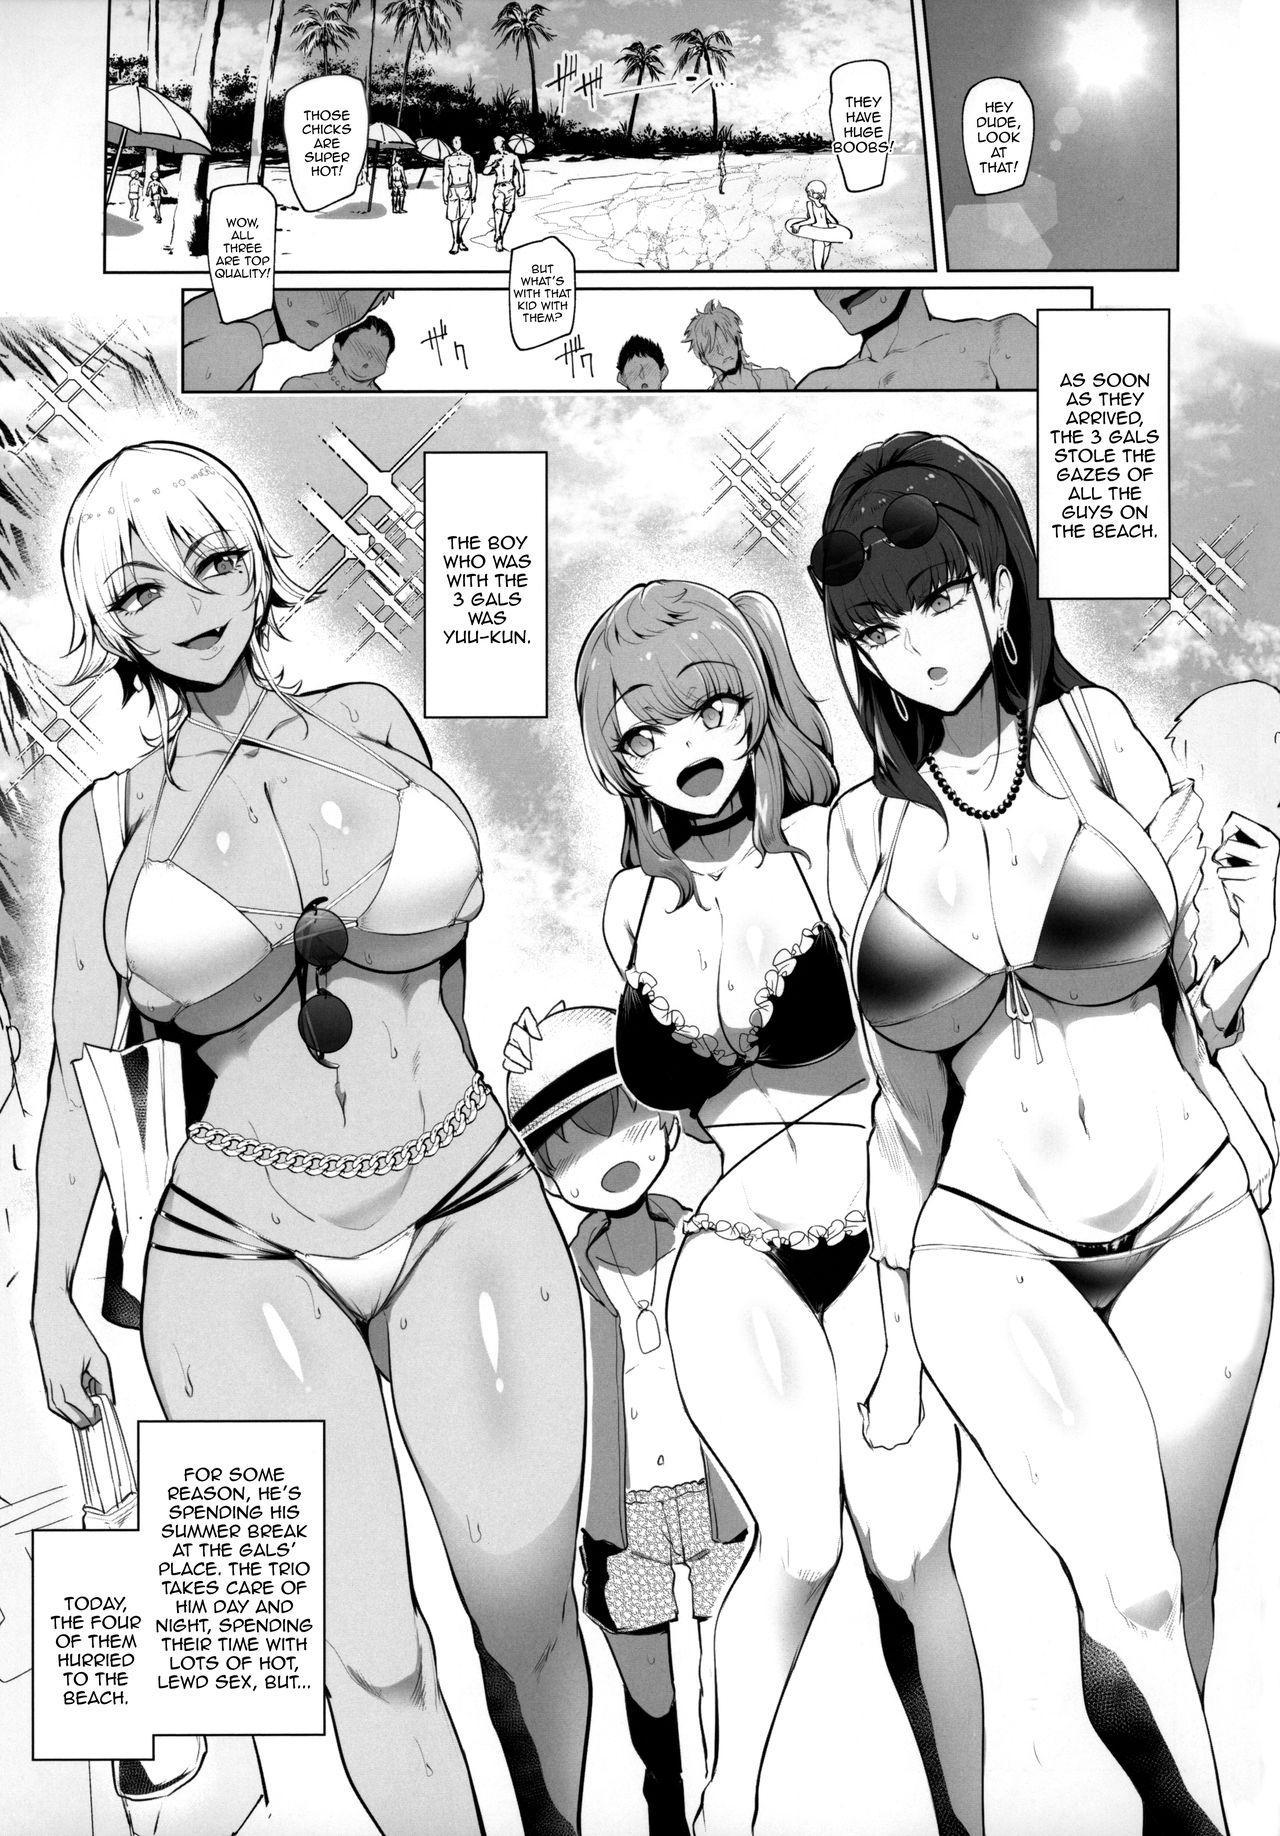 (C96) [A Gokuburi (Sian)] Odekake Shita no wa H na Gal Onee-chan-tachi to no Umi deshita | Visiting the beach with the lewd gal onee-sans [English] [Tabunne Scans] 2